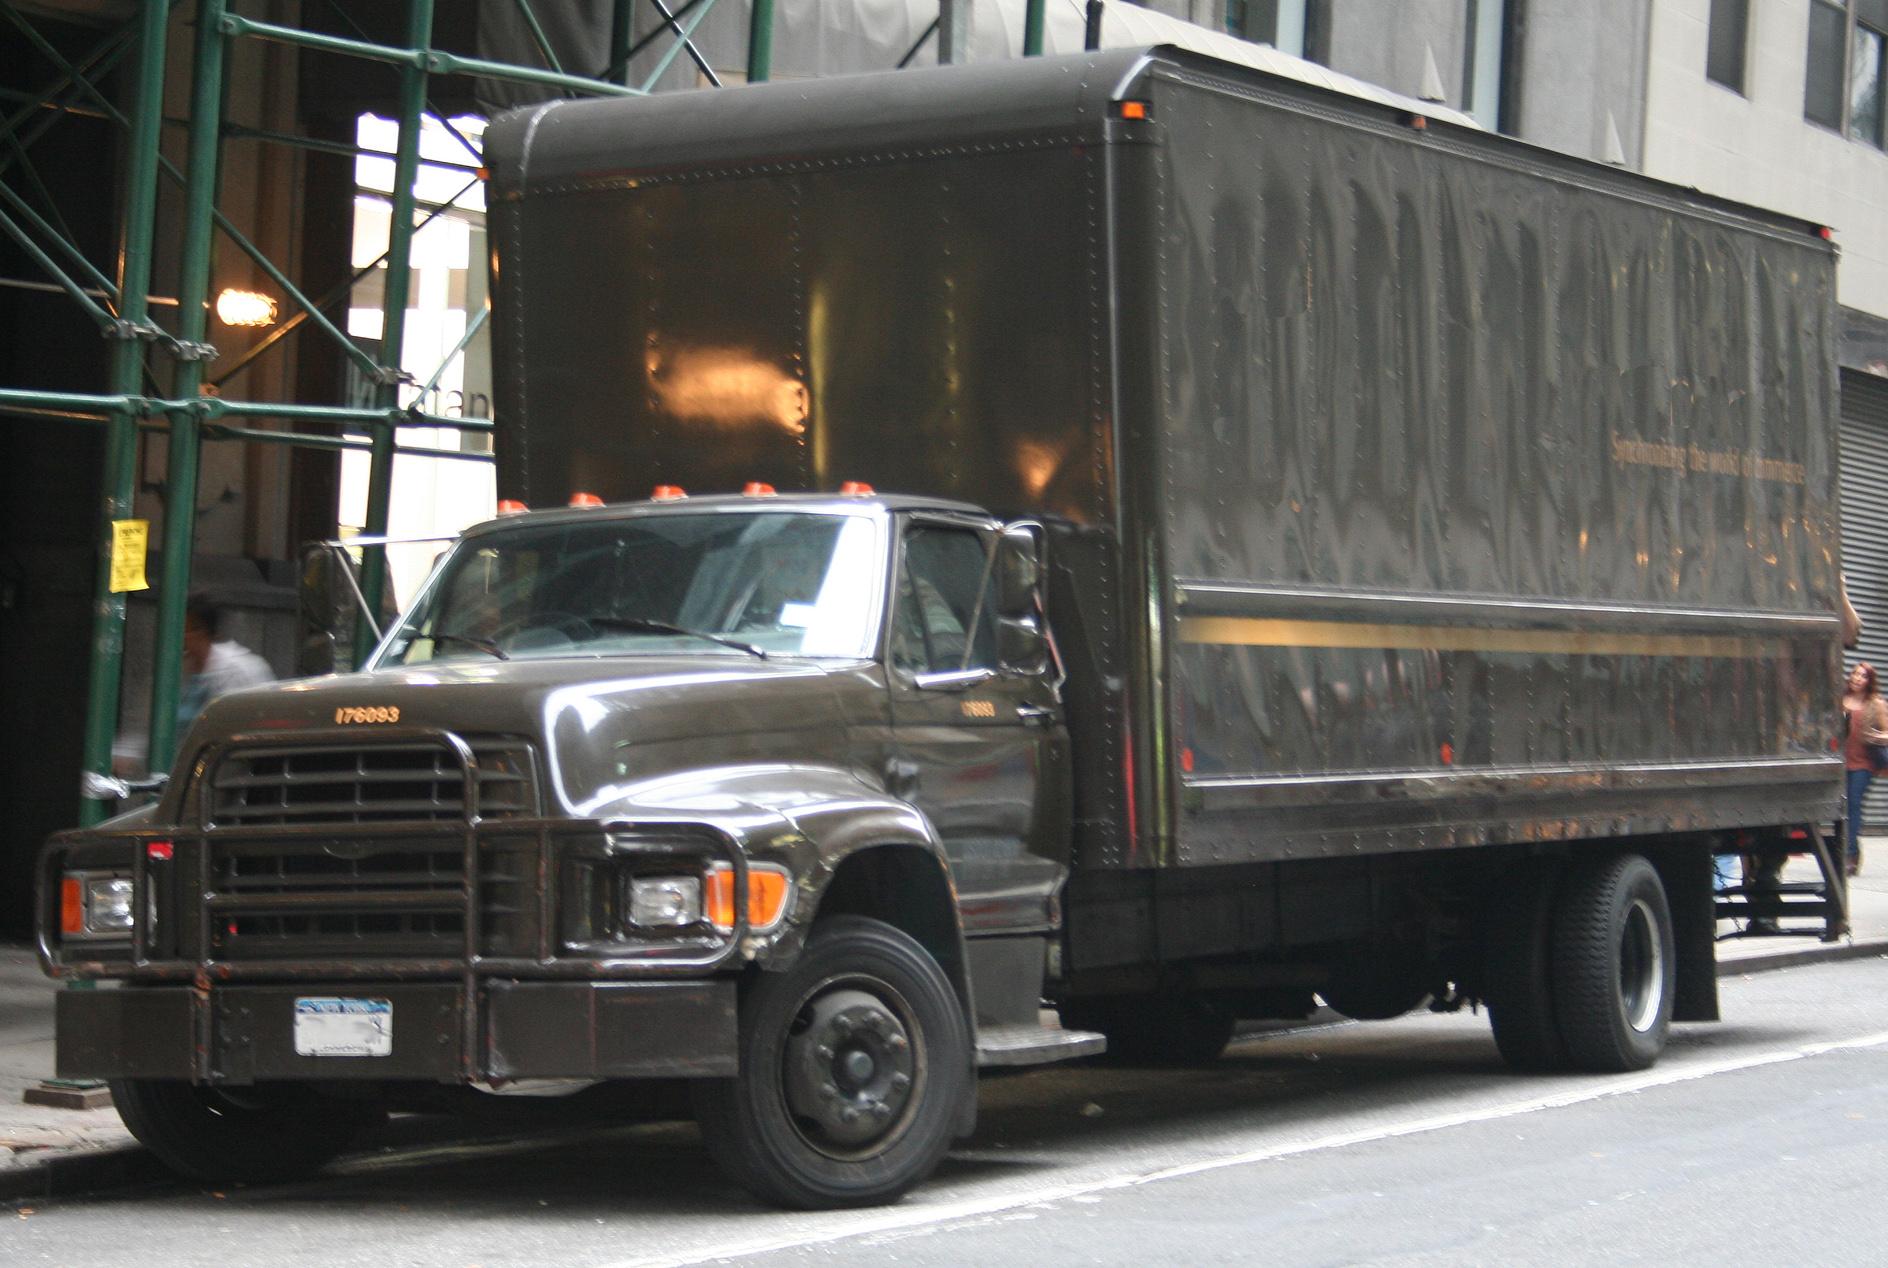 ford f series heavy duty trucks. Black Bedroom Furniture Sets. Home Design Ideas